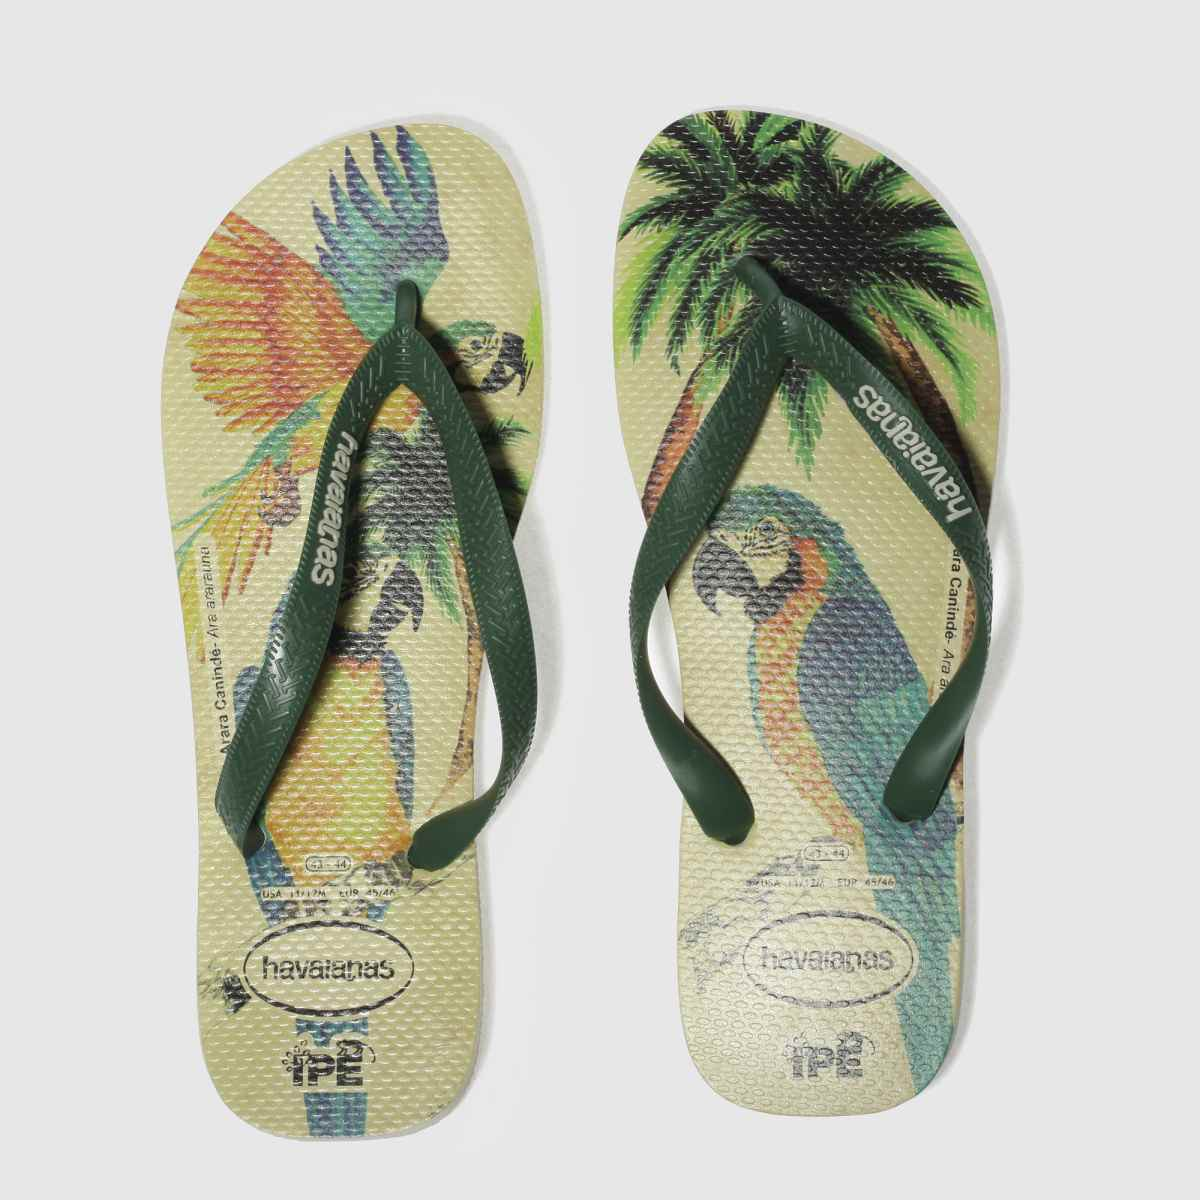 Havaianas Havaianas Multi Ipe Sandals